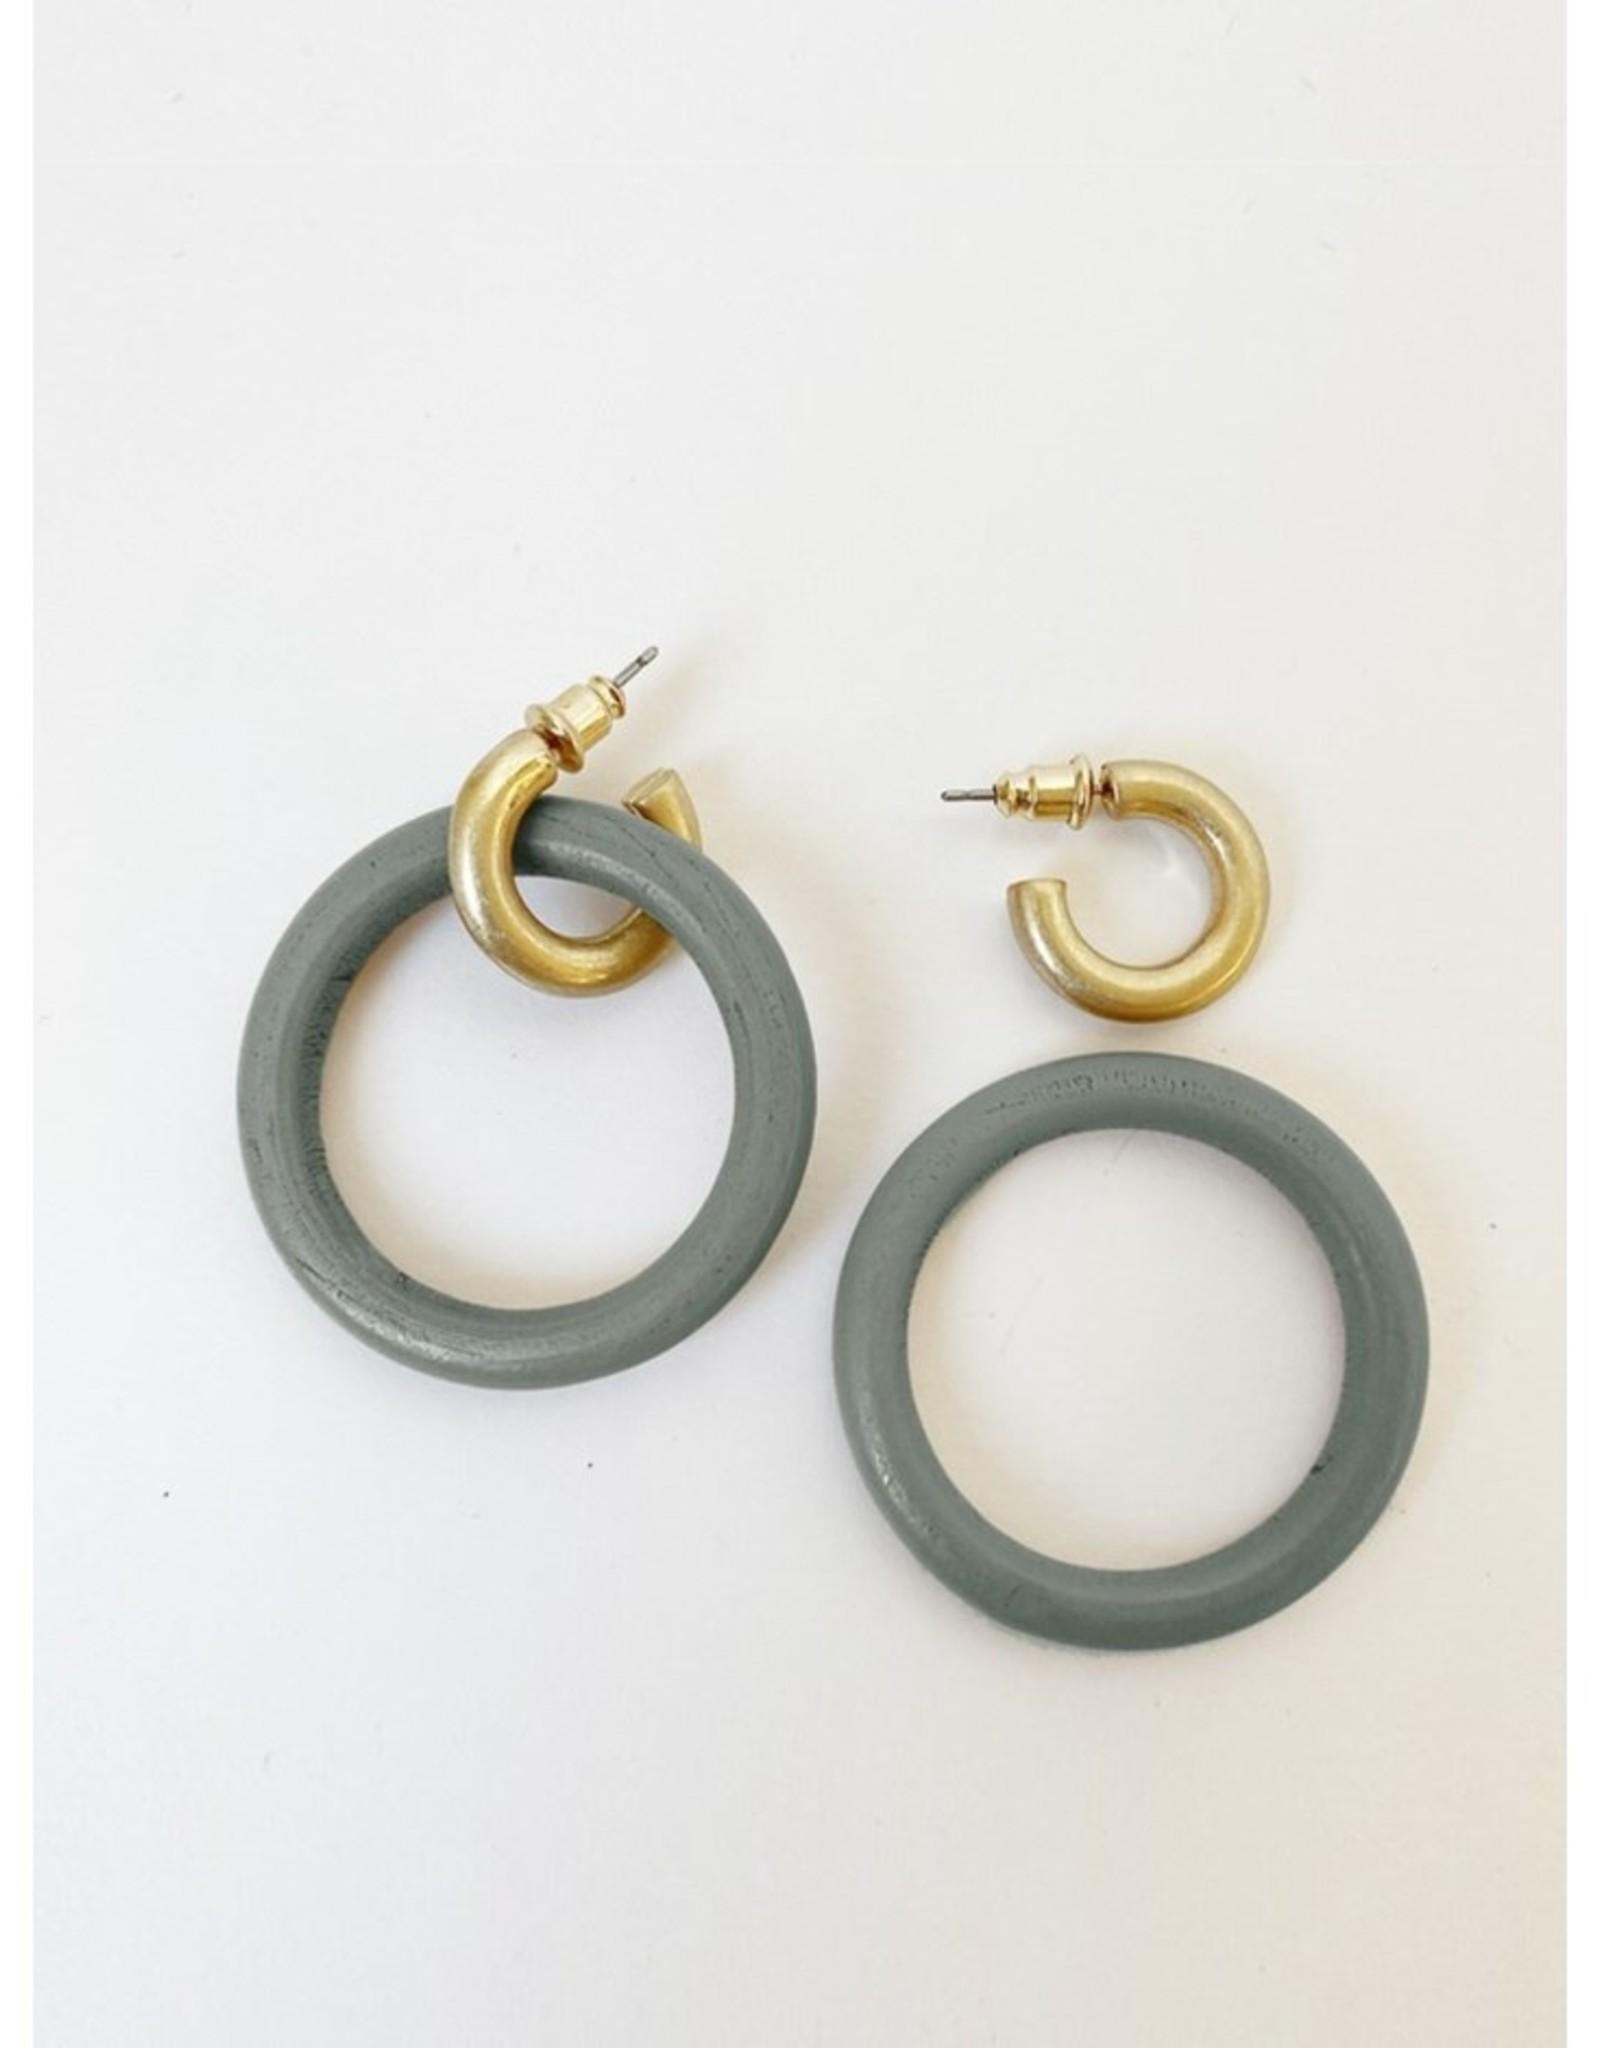 Wooden Ring on Worn Finish Metallic Hoops-grey/gold